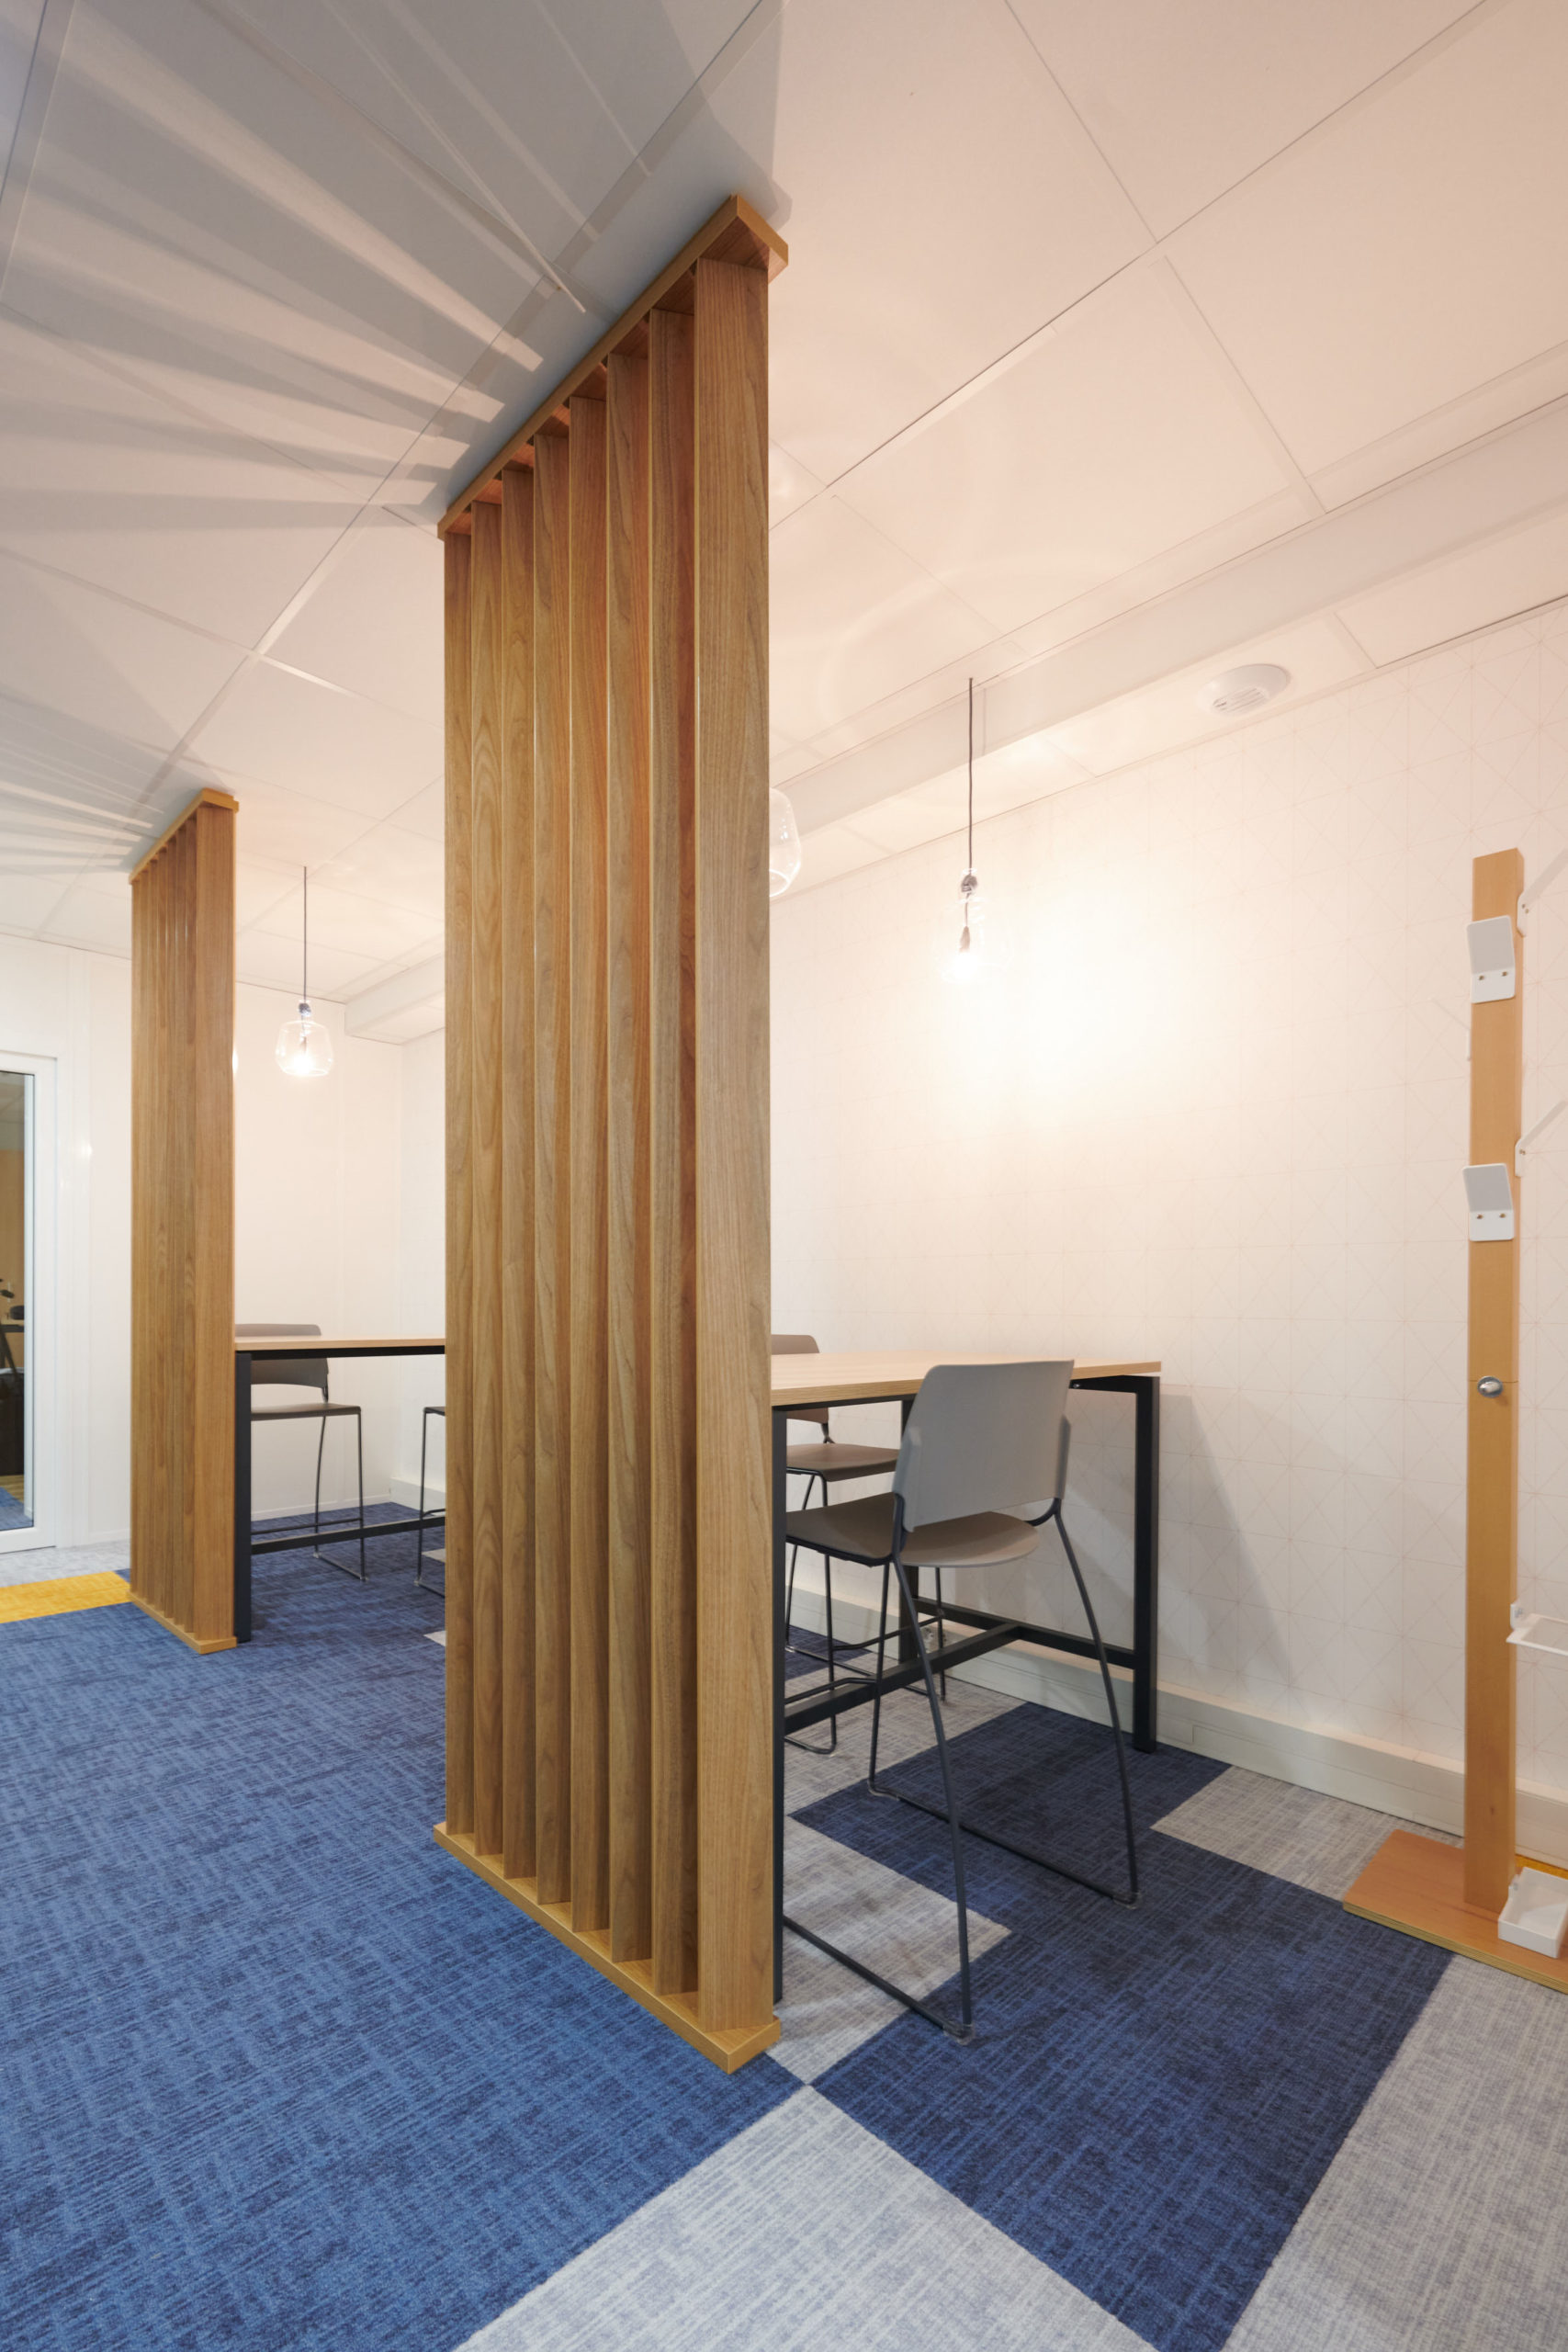 Hoya-espace informel-claustra-porte manteau bois-suspension